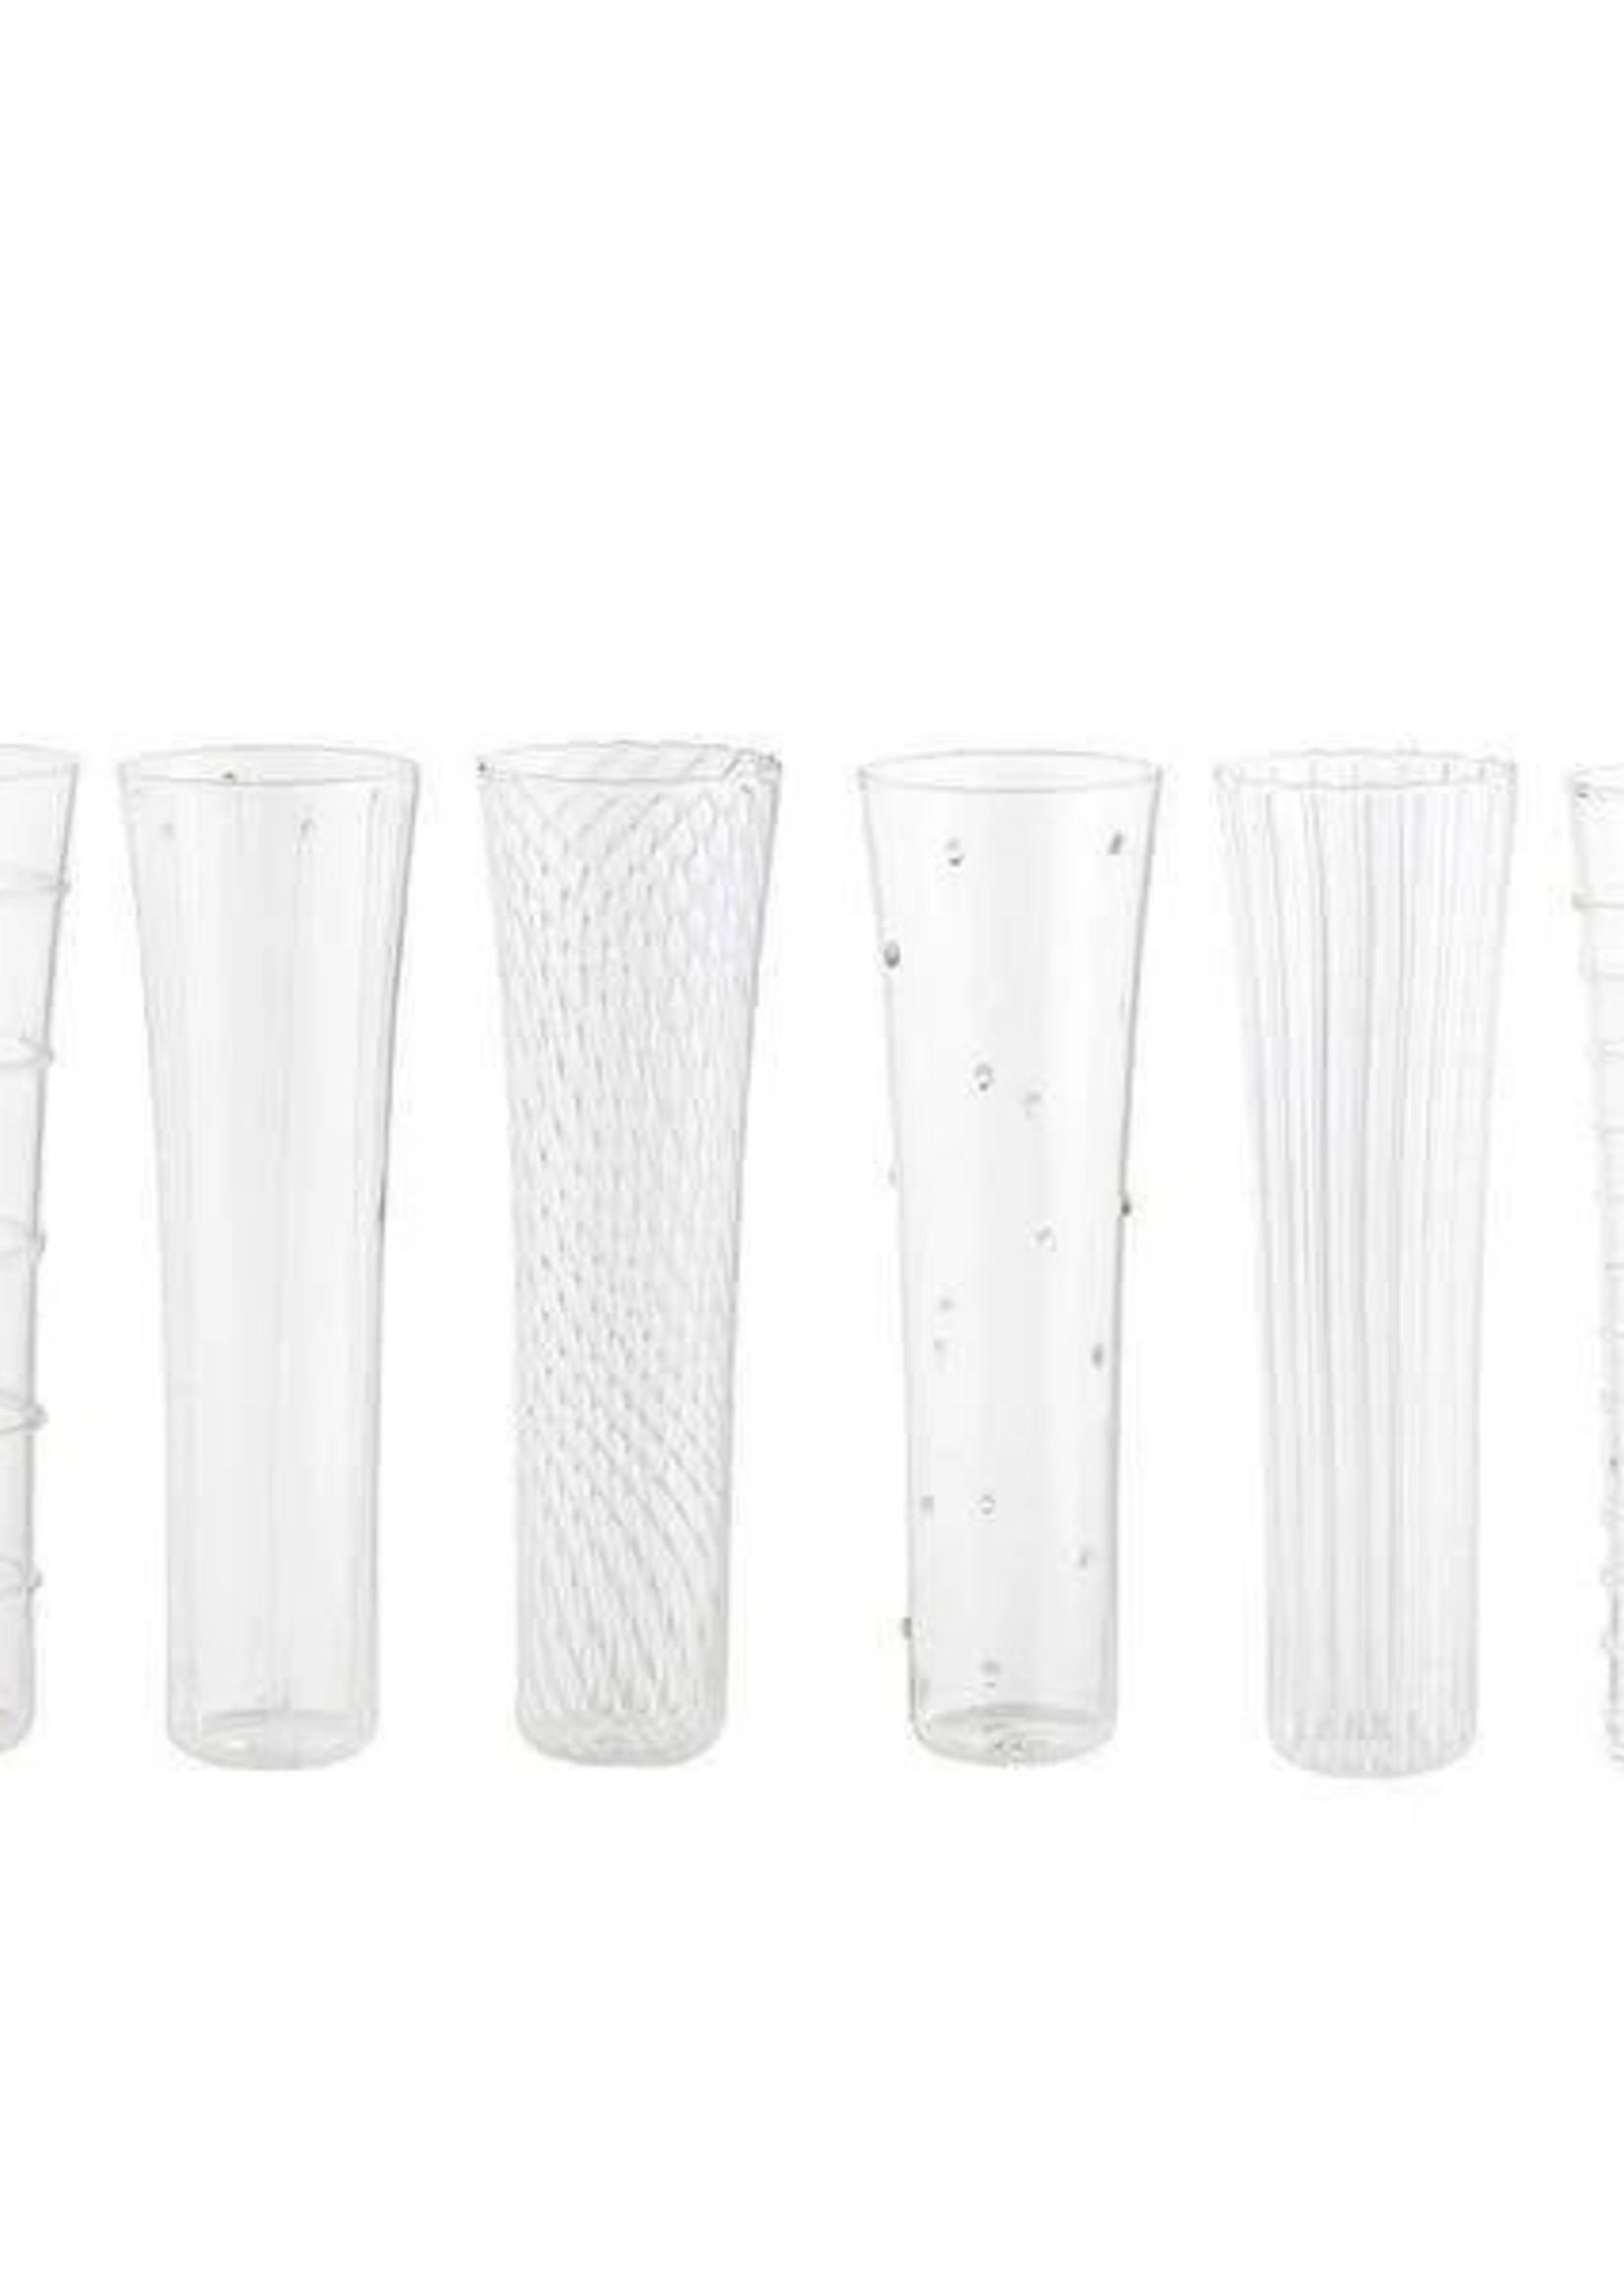 Design Ideas Design Ideas - Livenza Champagne Flutes Set of 6